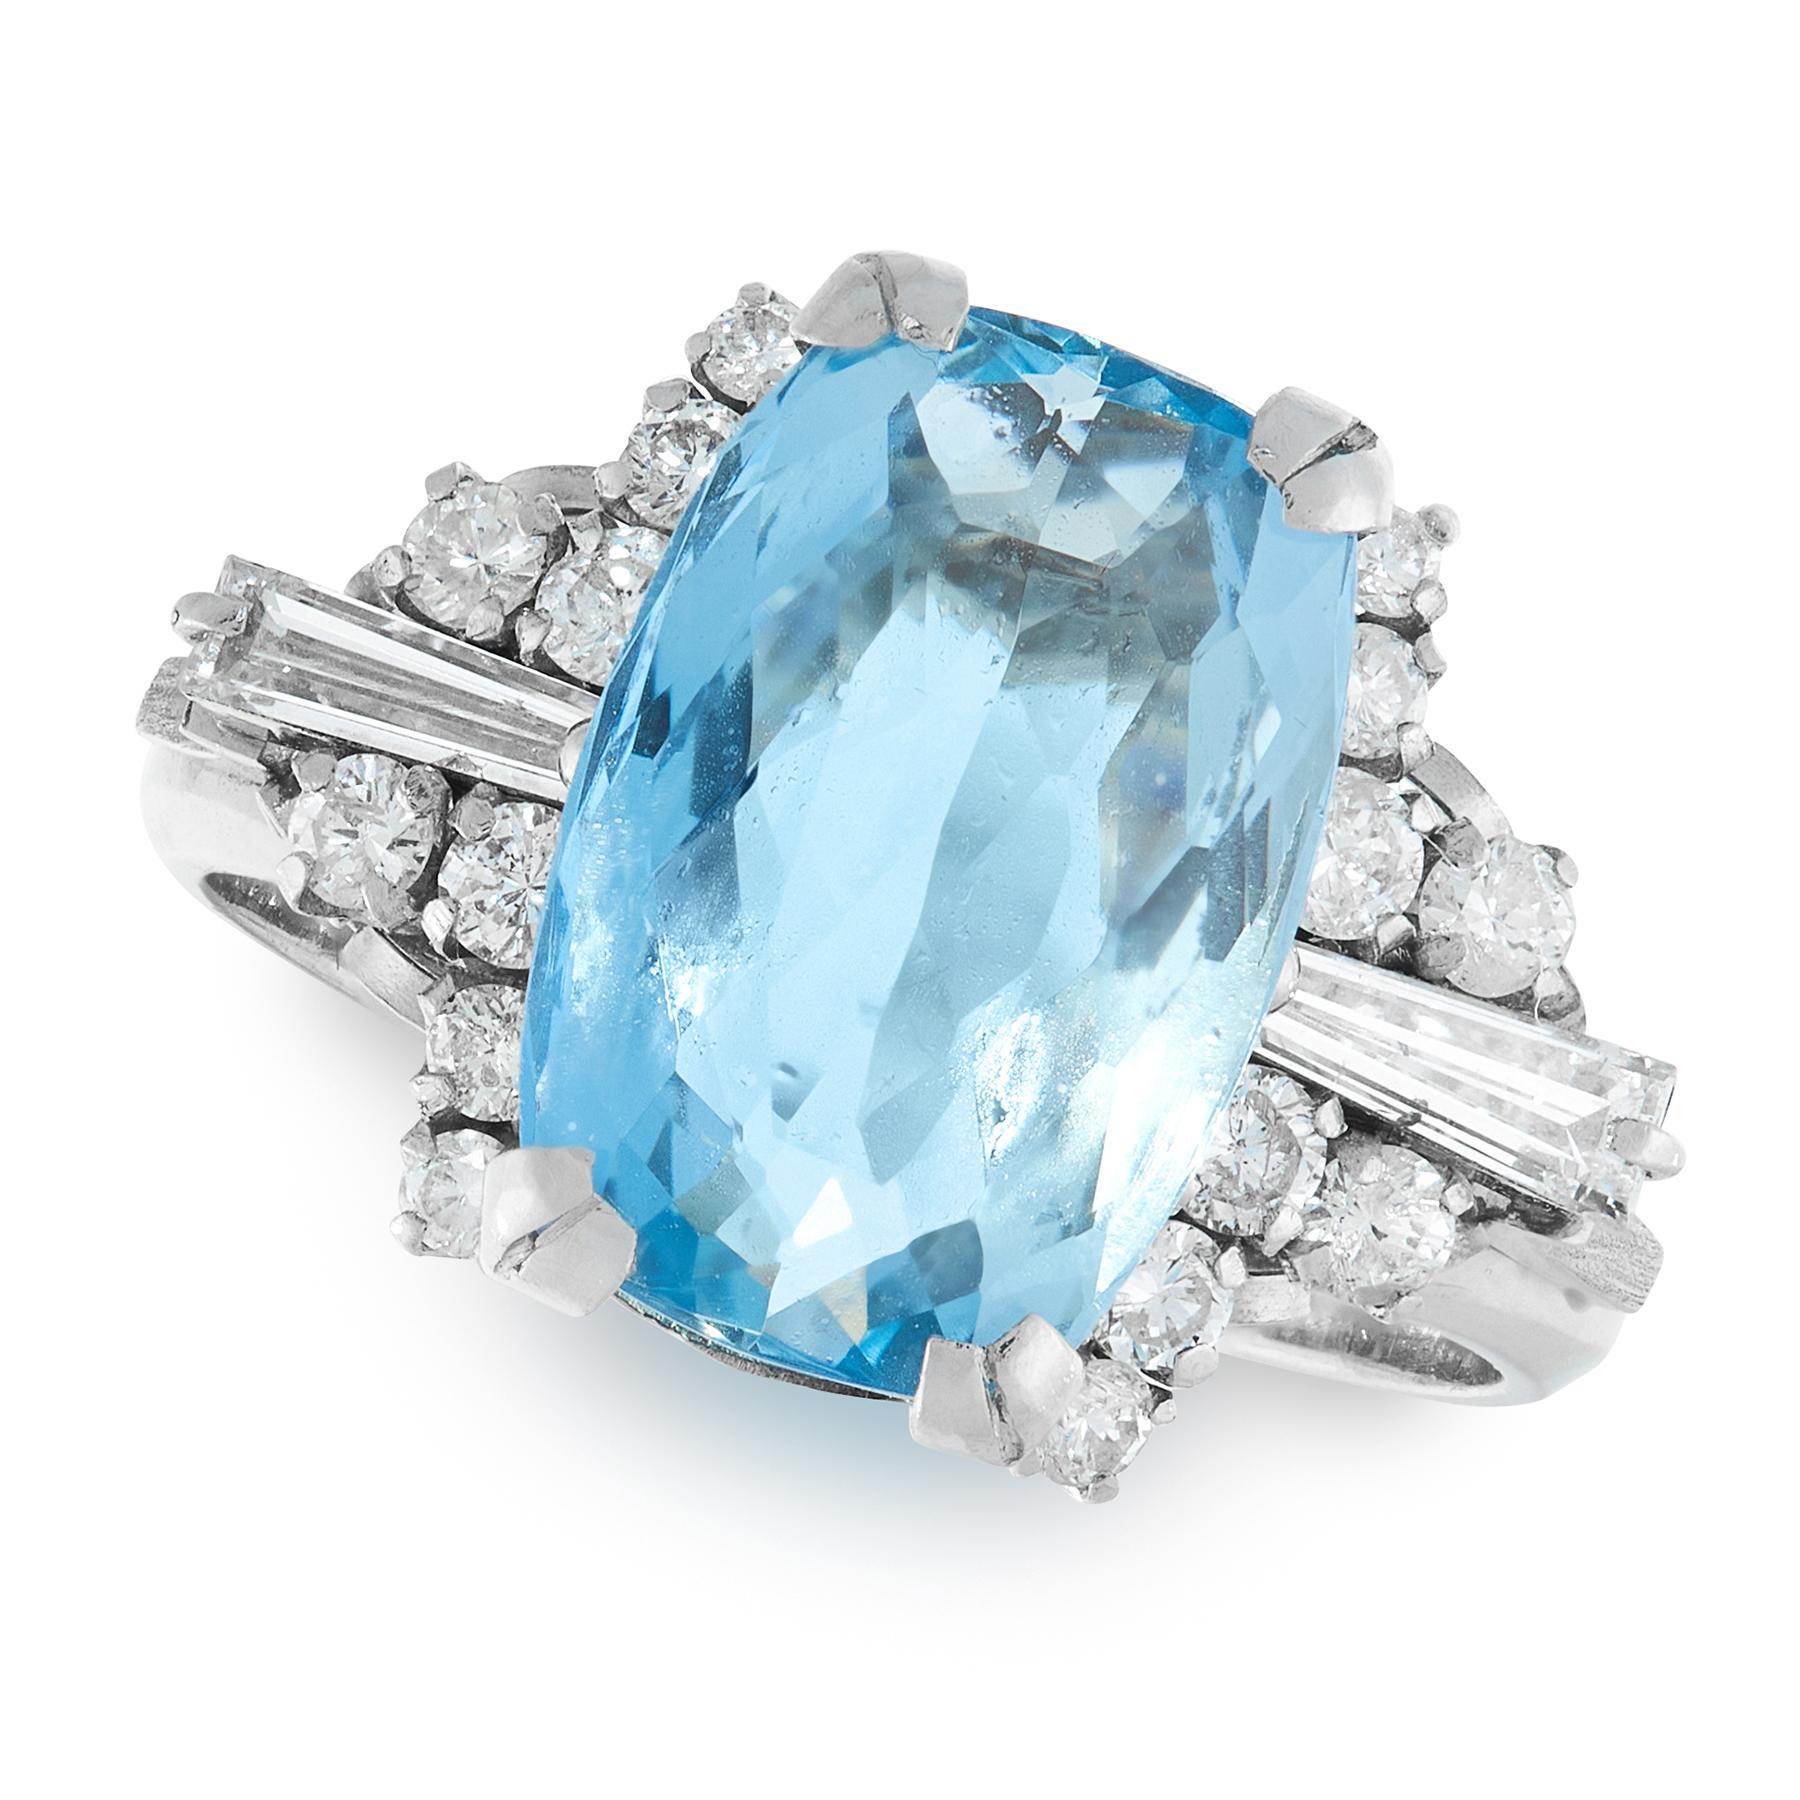 AN AQUAMARINE AND DIAMOND RING in platinum, set with an cushion cut aquamarine of 4.70 carats, the